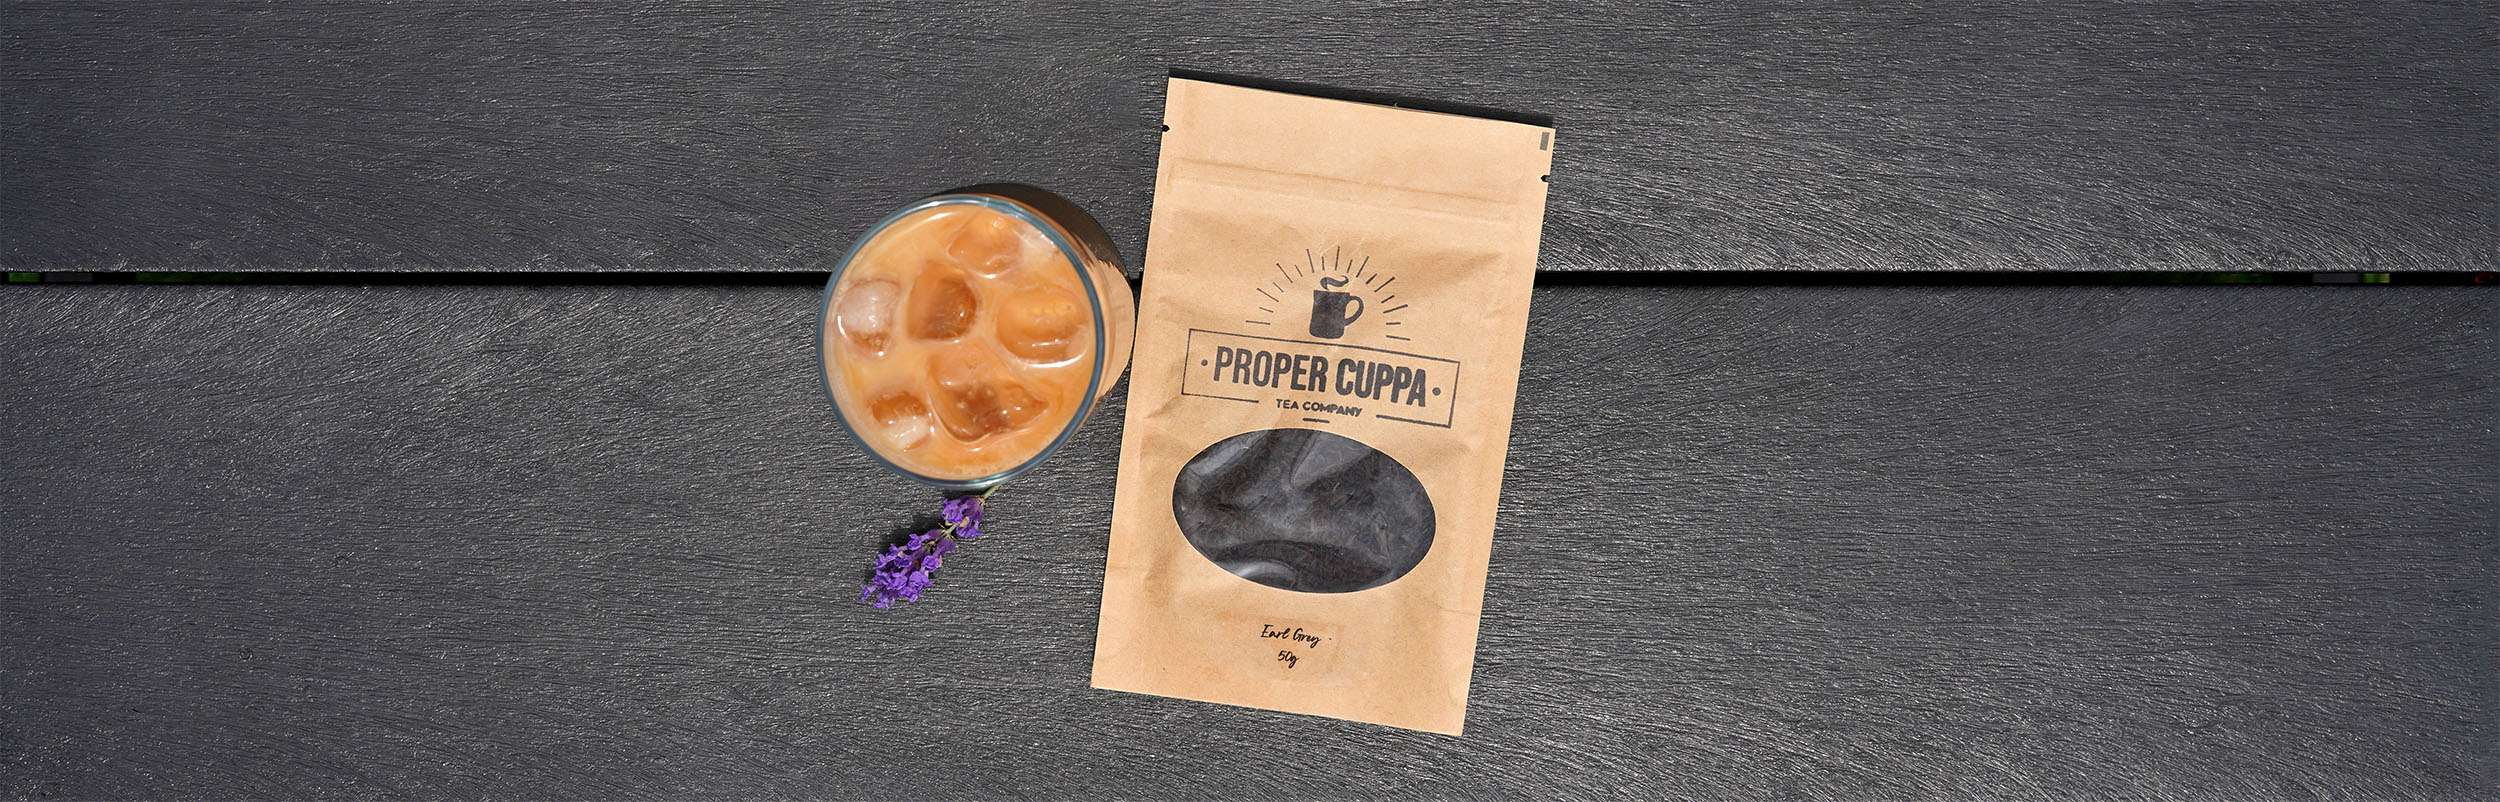 Proper Cuppa Iced Tea Latte